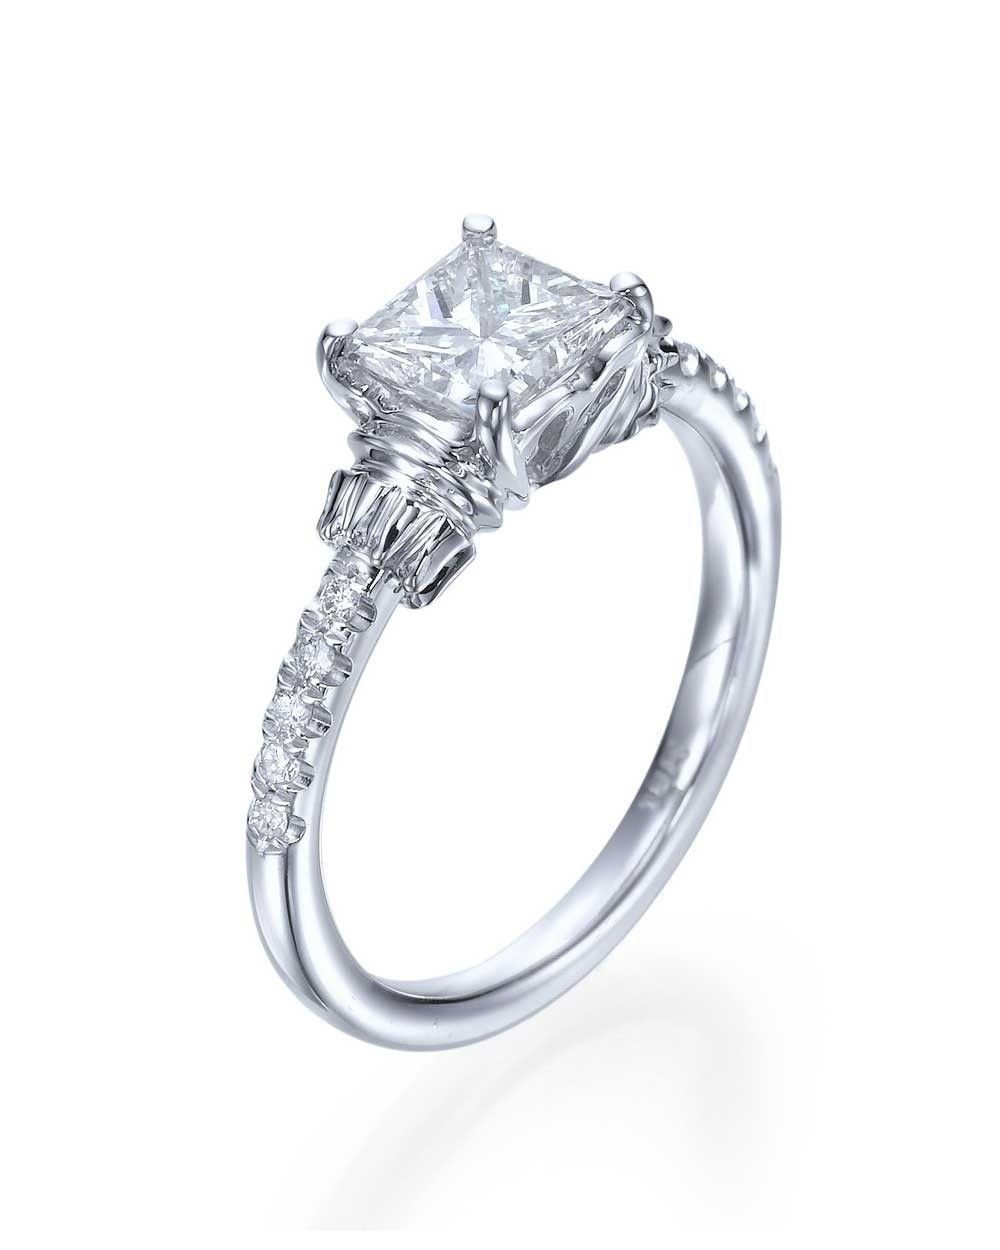 Princess Cut Vintage Engagement Ring in White Gold or Platinum